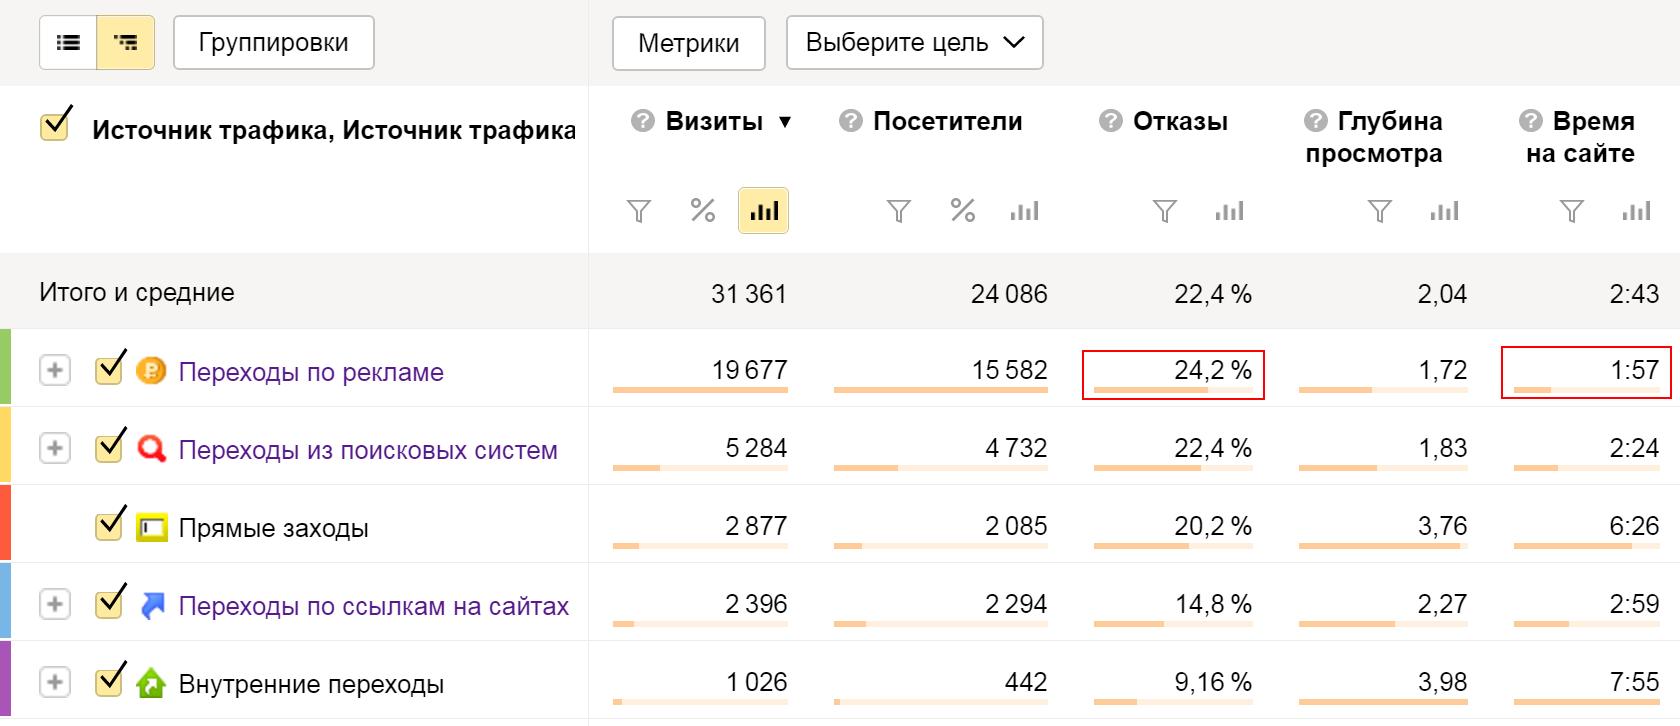 Анализ показателей качества трафика